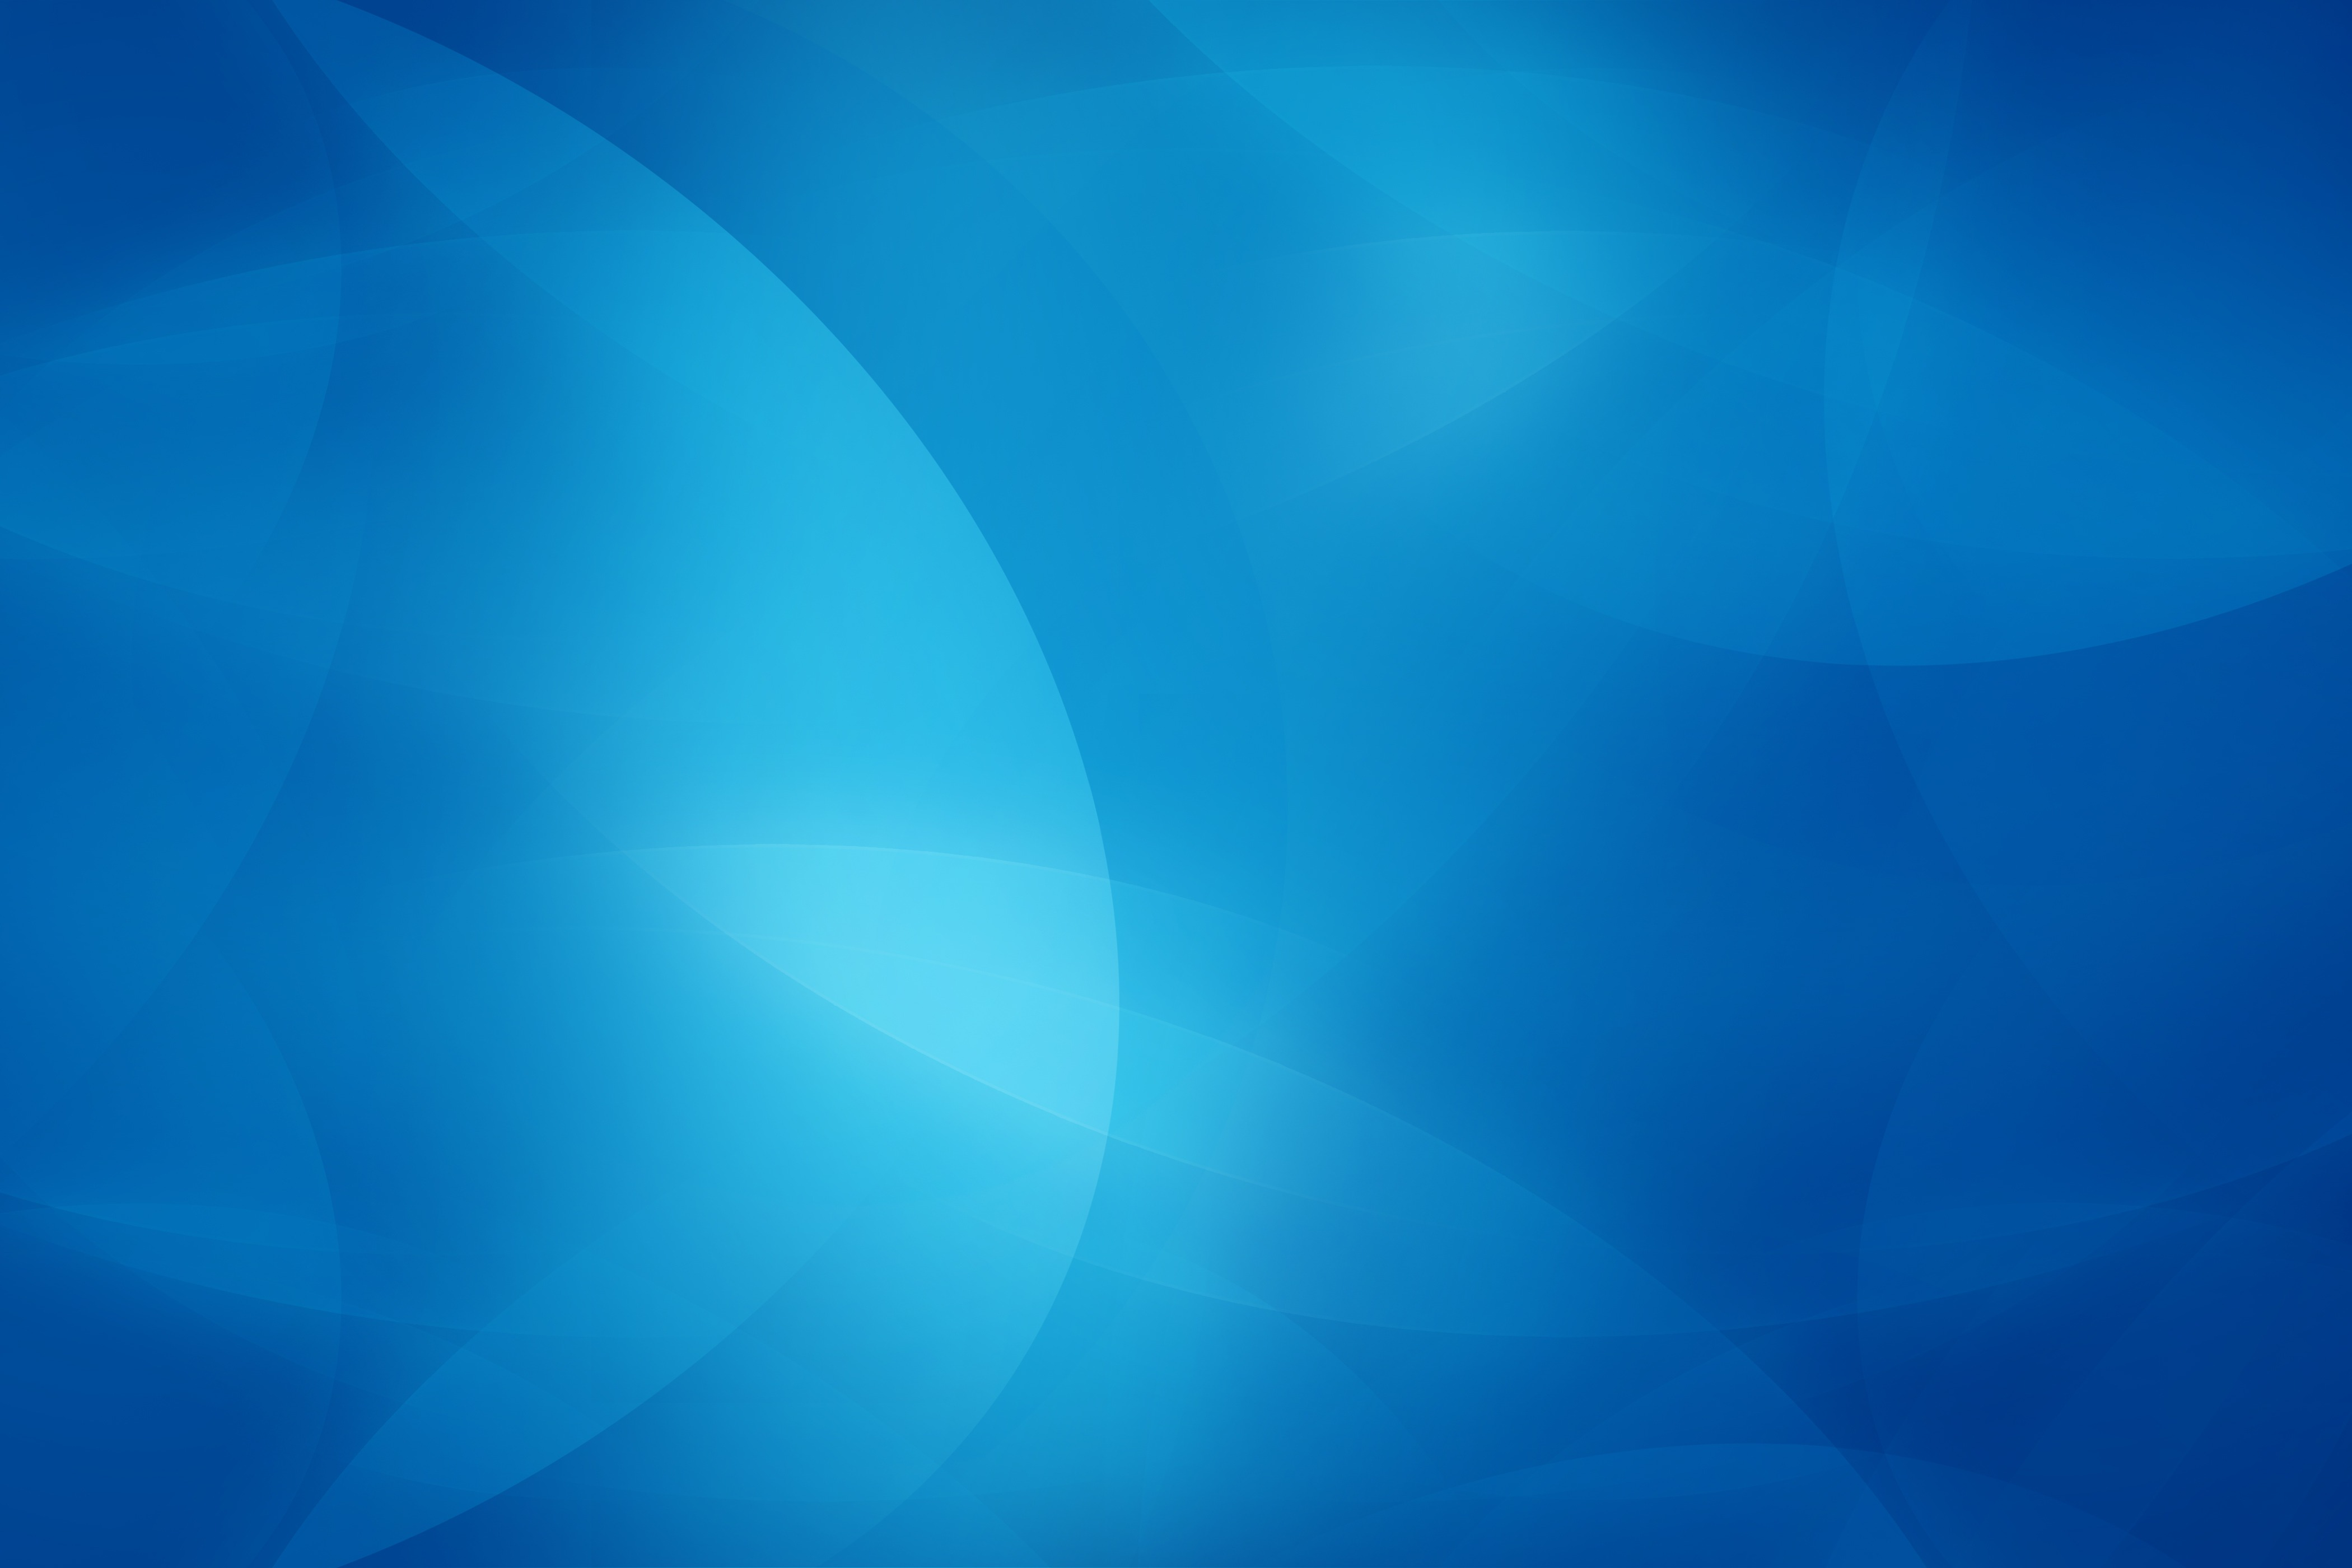 Elegant Blue Background   KnowTheTruthRadio 4200x2800